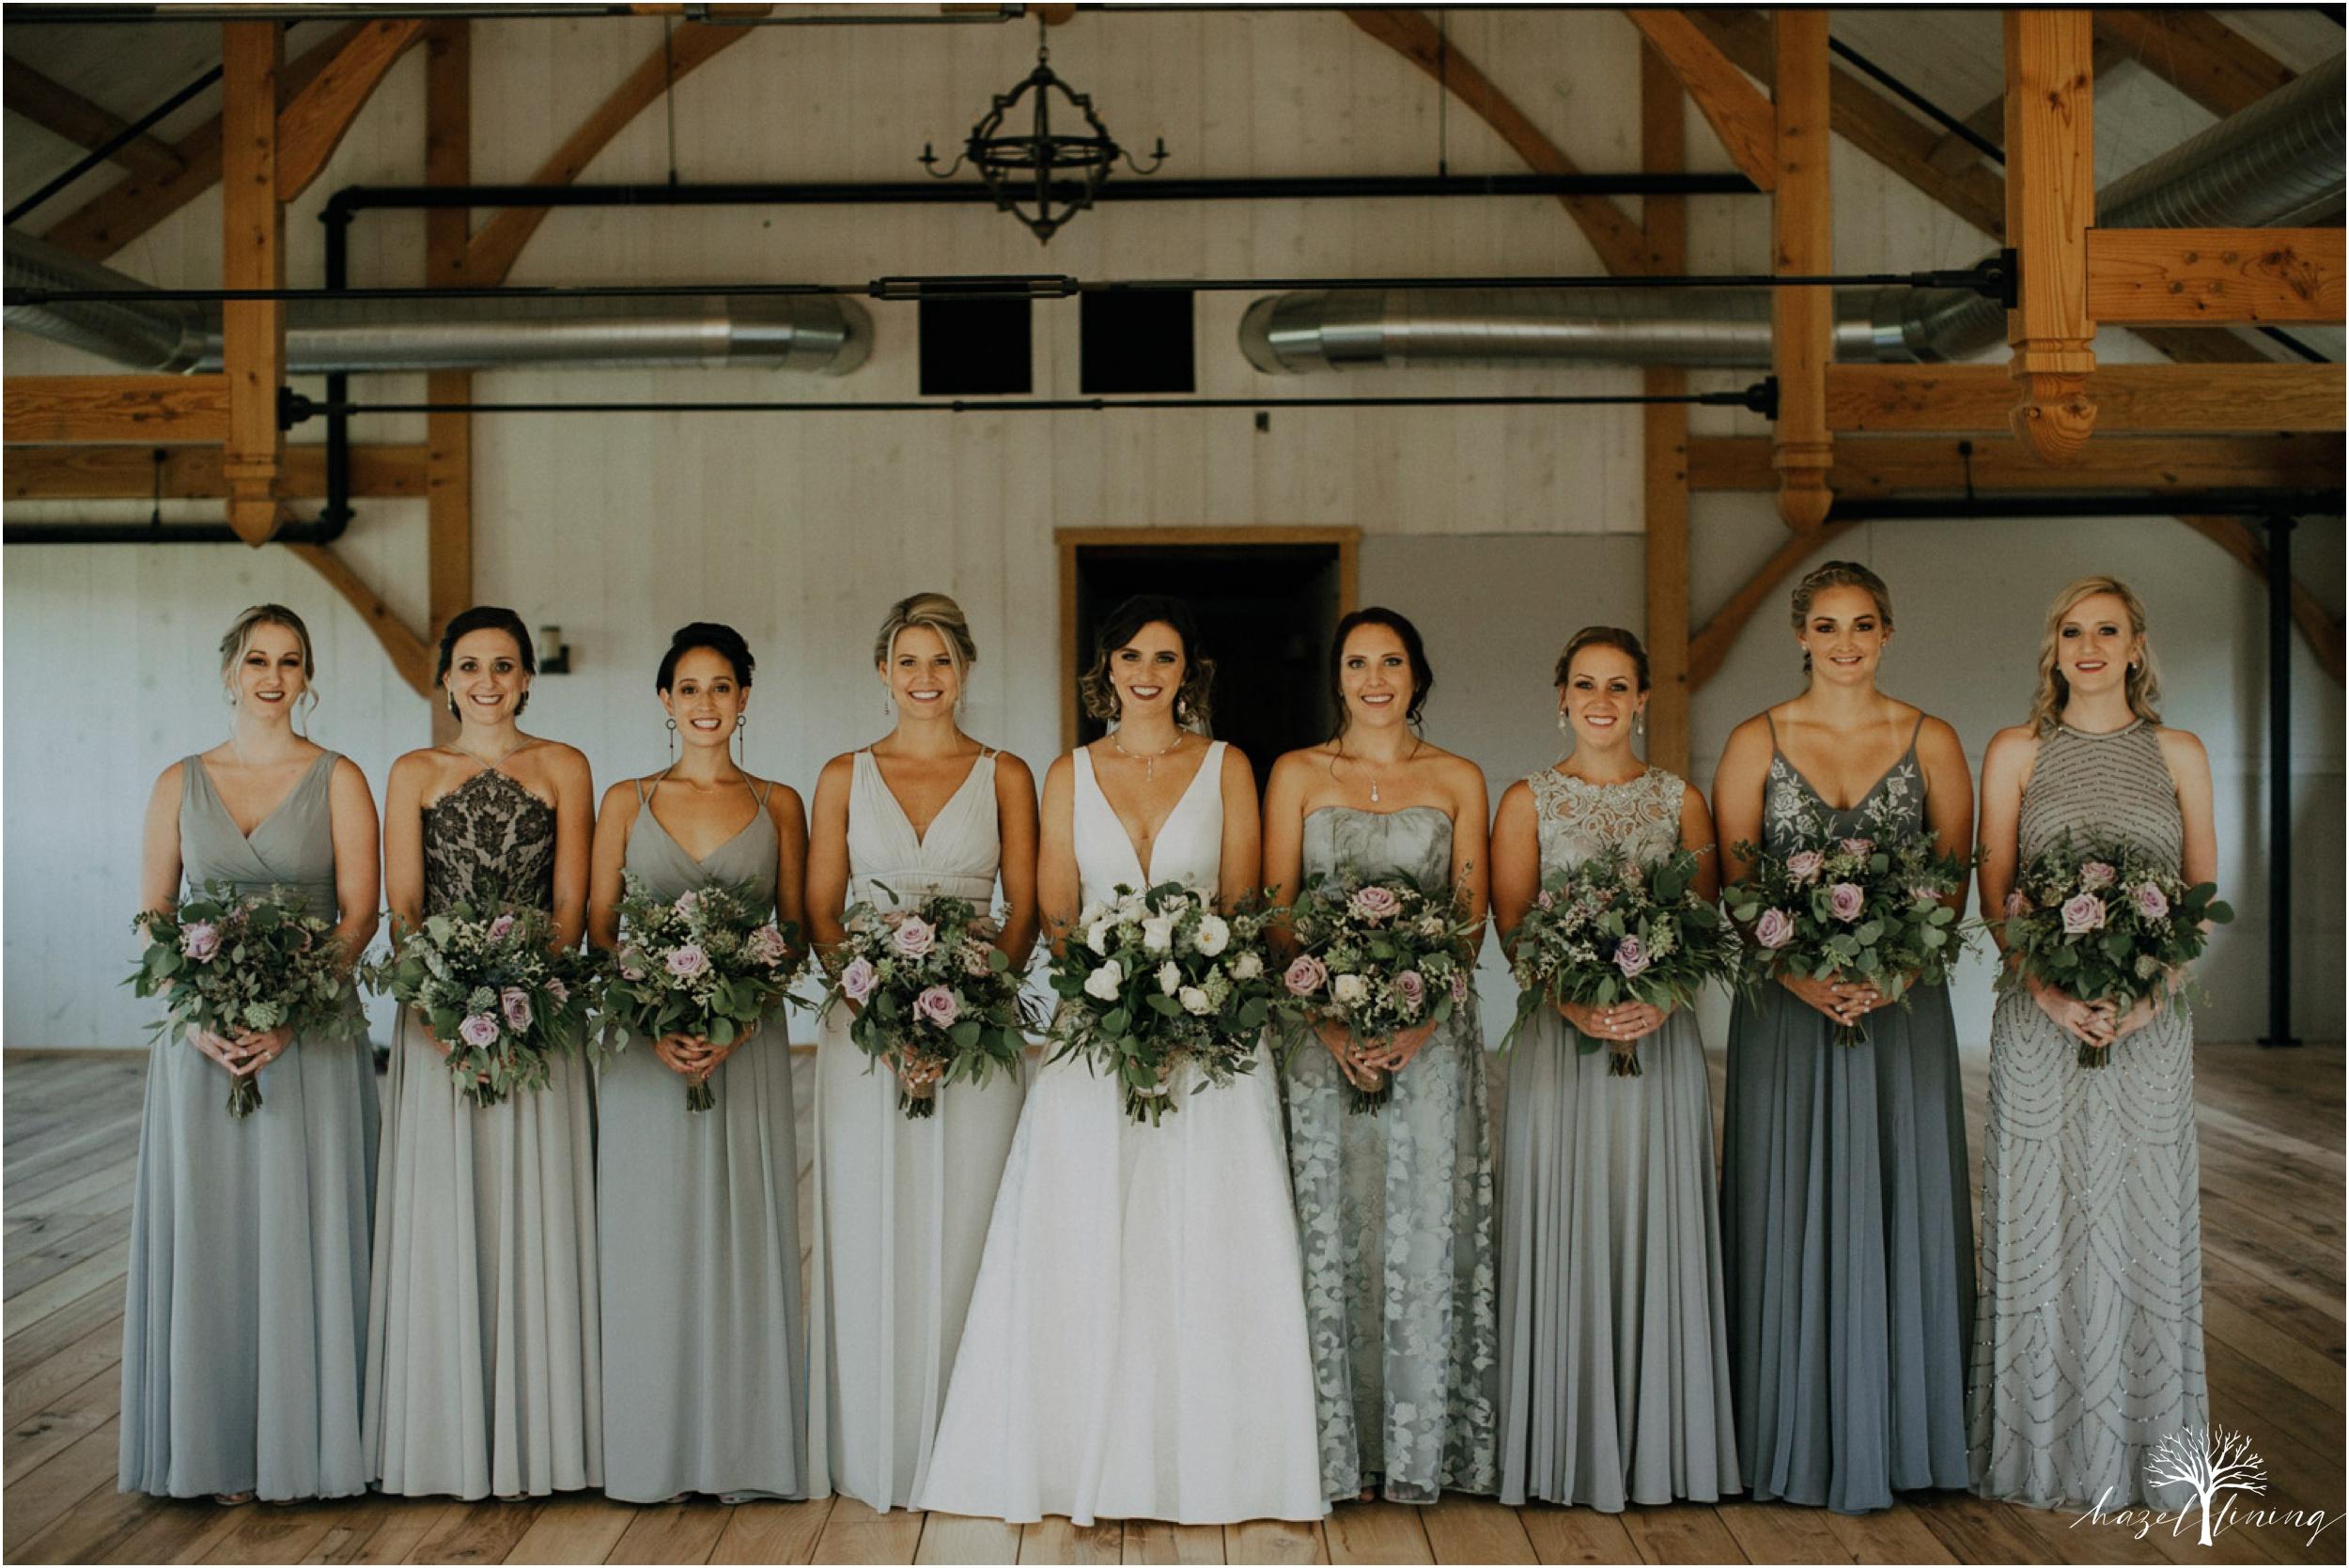 maureen-hepner-anthony-giordano-rose-bank-winery-newtow-pennsylvania-luxury-summer-wedding-hazel-lining-photography-destination-elopement-wedding-engagement-photography_0027.jpg